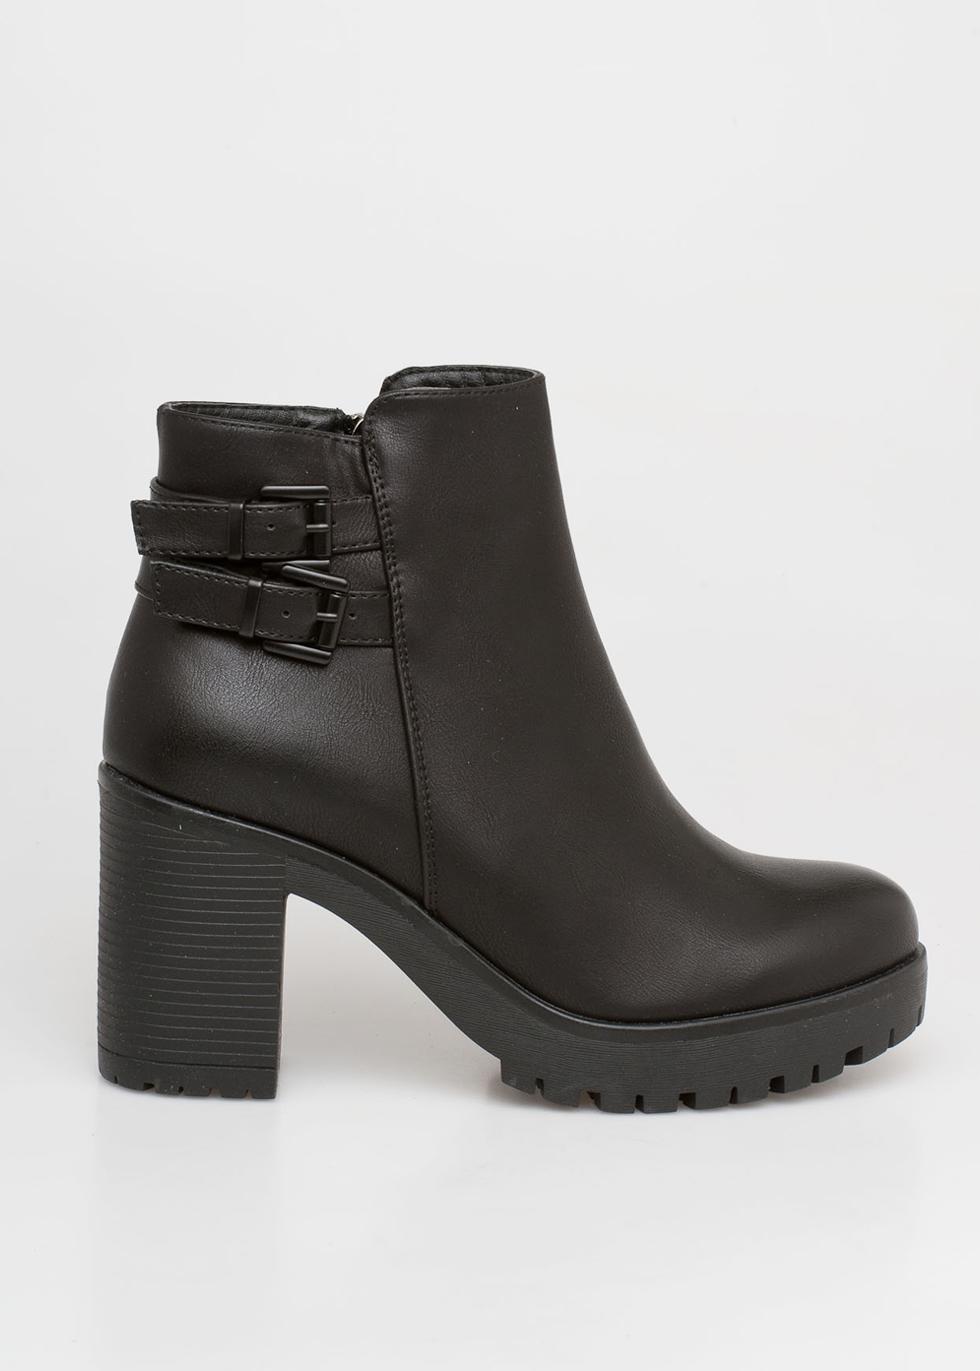 Adele block heel boot, μαύρο μποτάκια